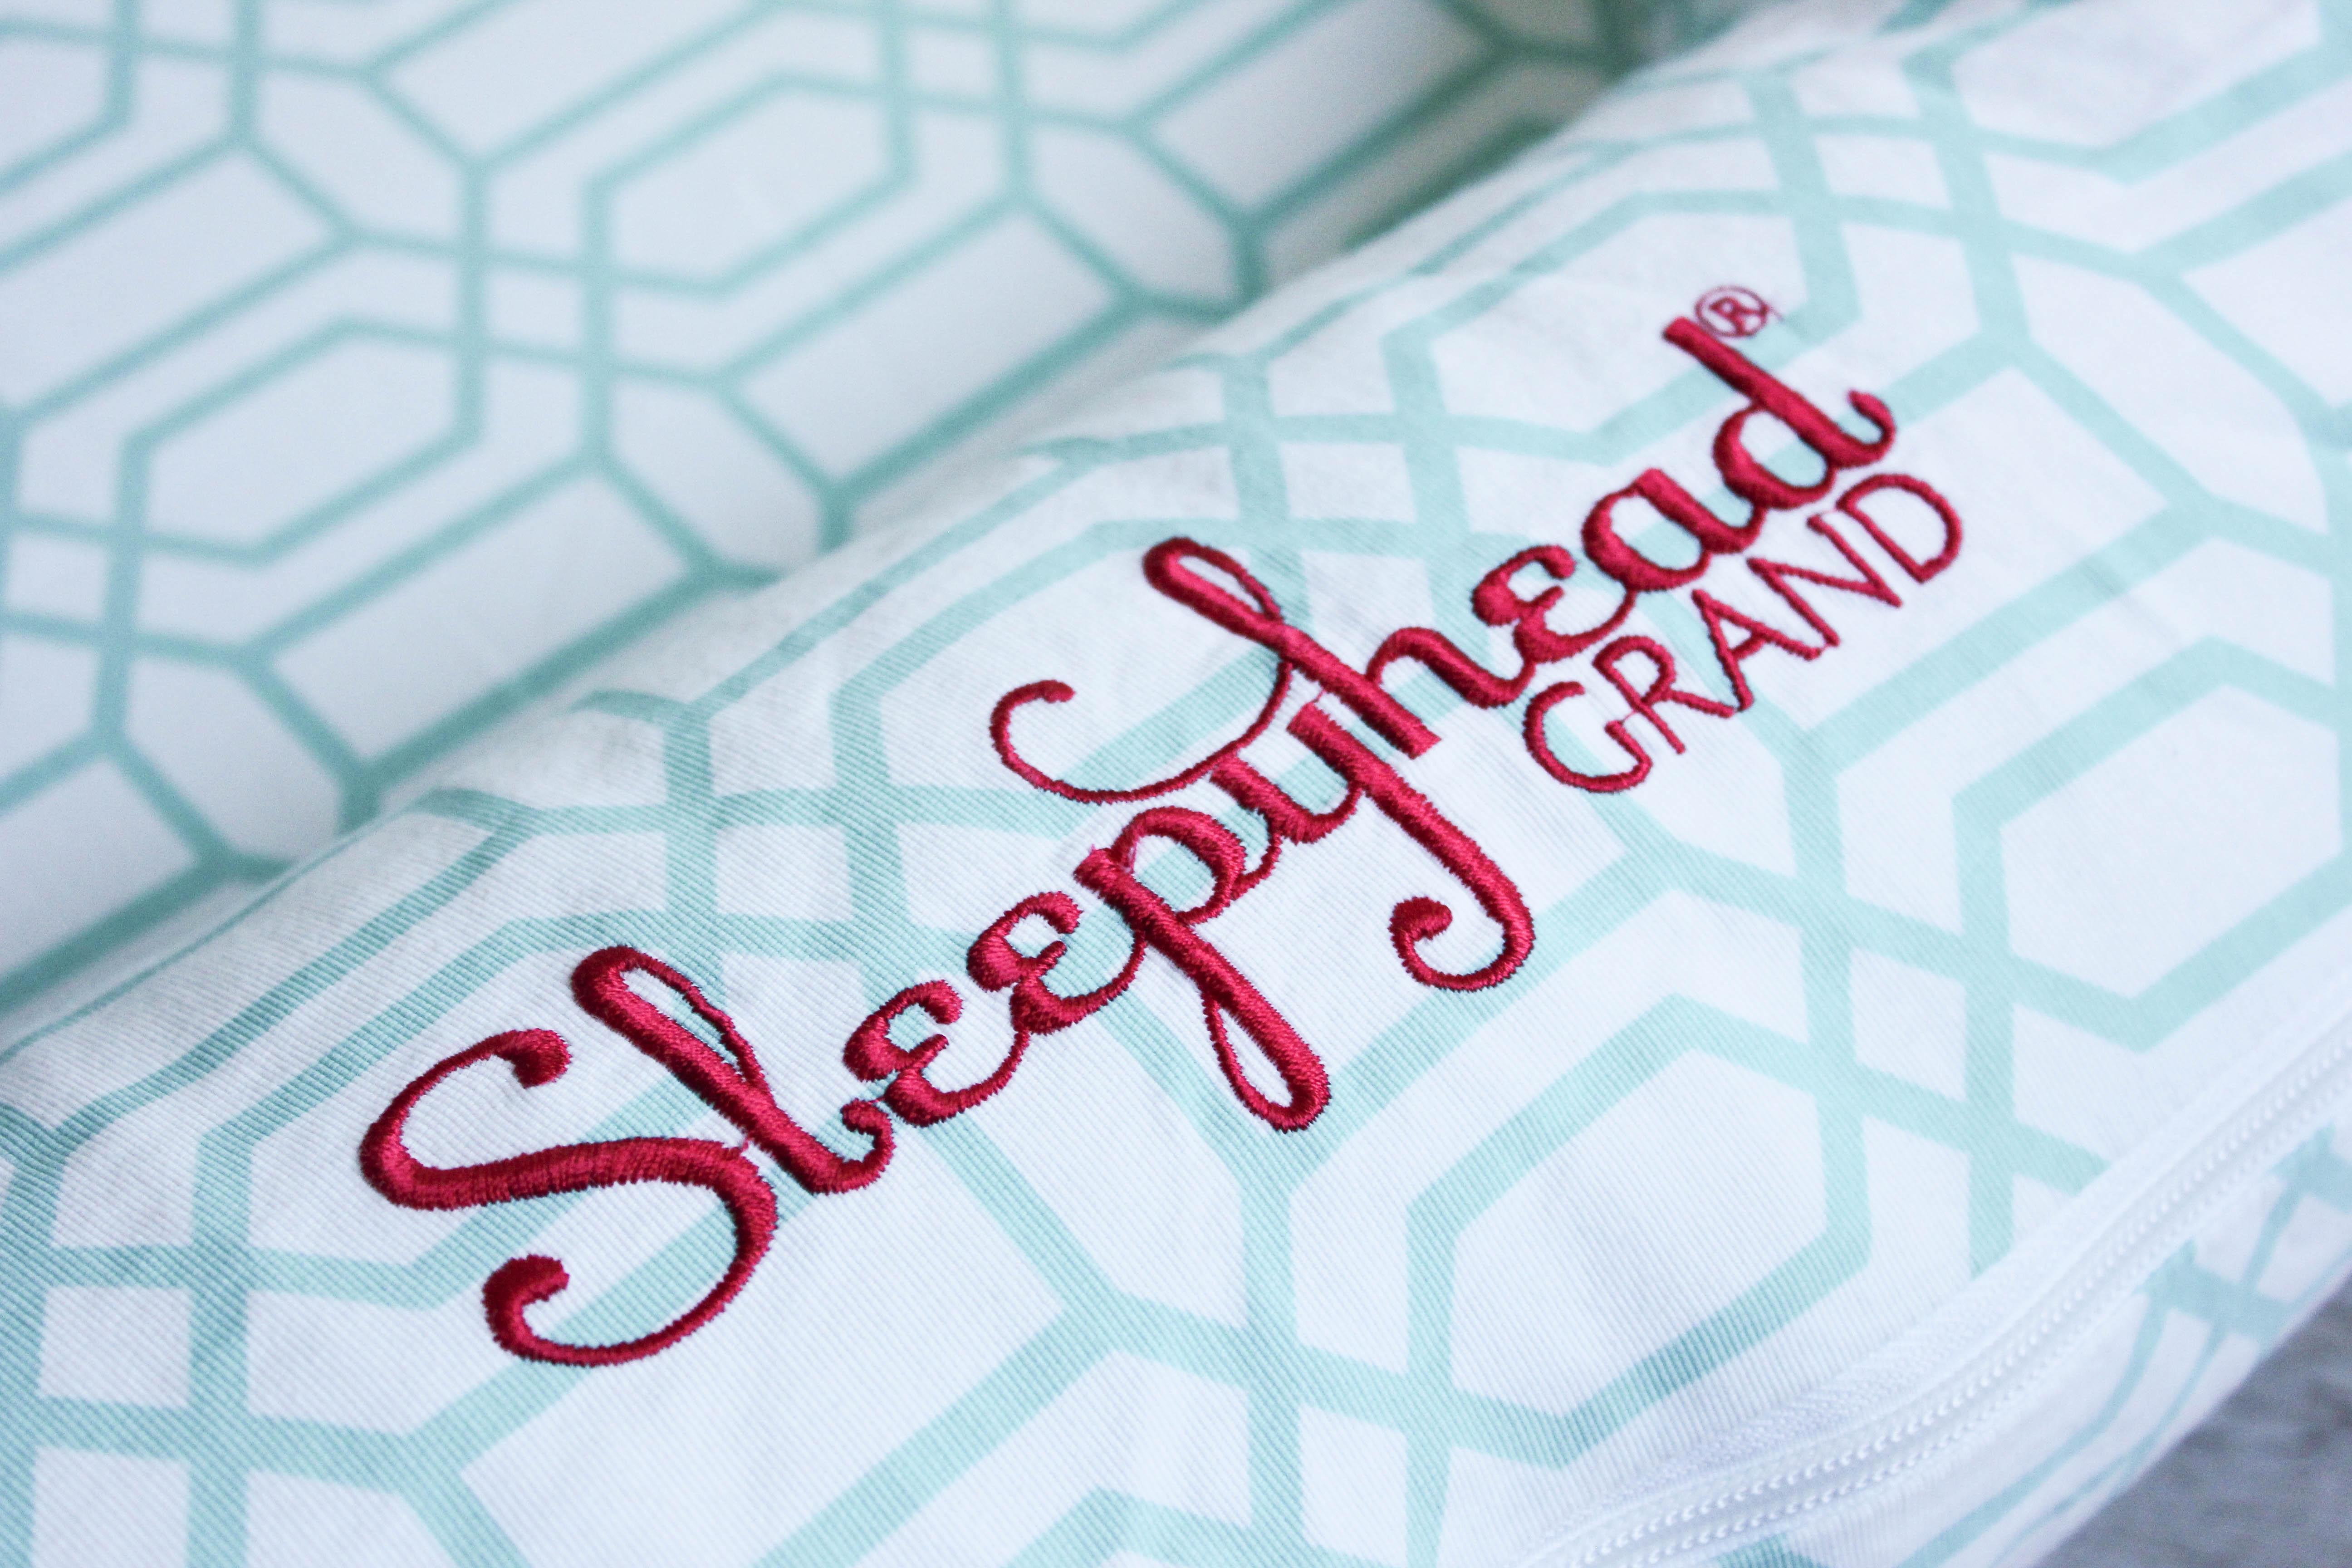 Ervaring Sleepyhead Grand